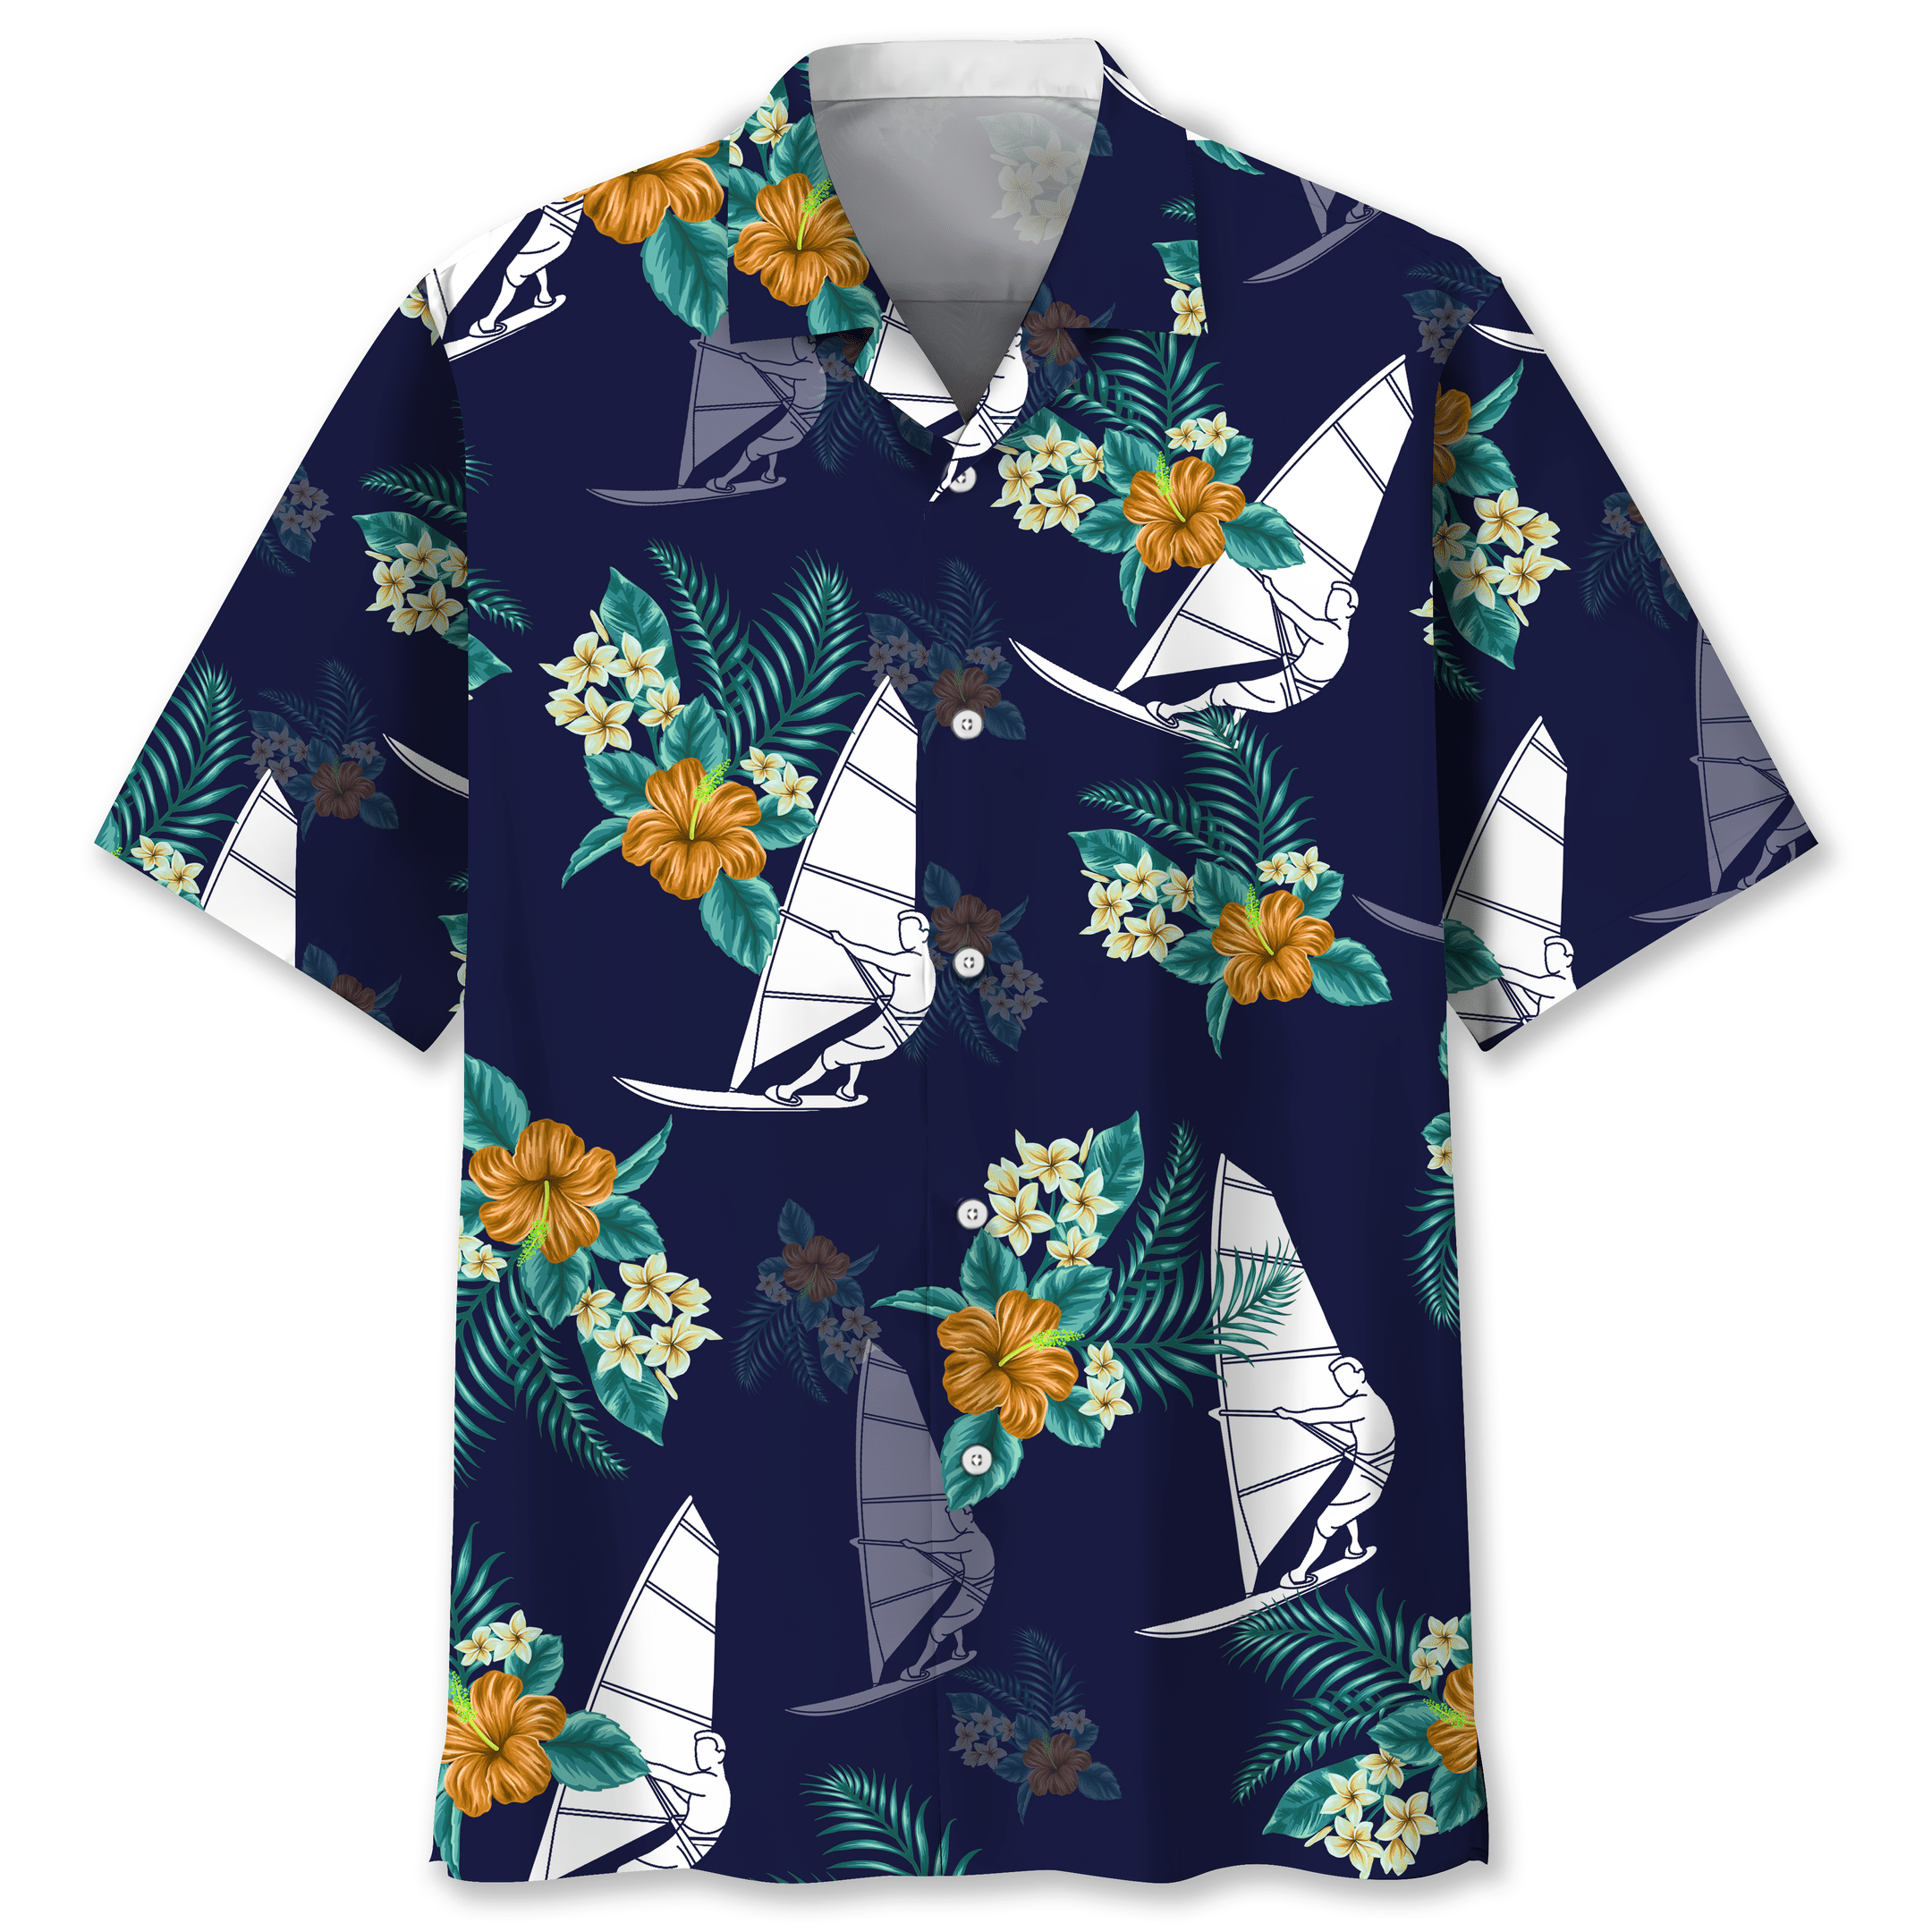 Windsurfing Hawaiian Tropical shirt